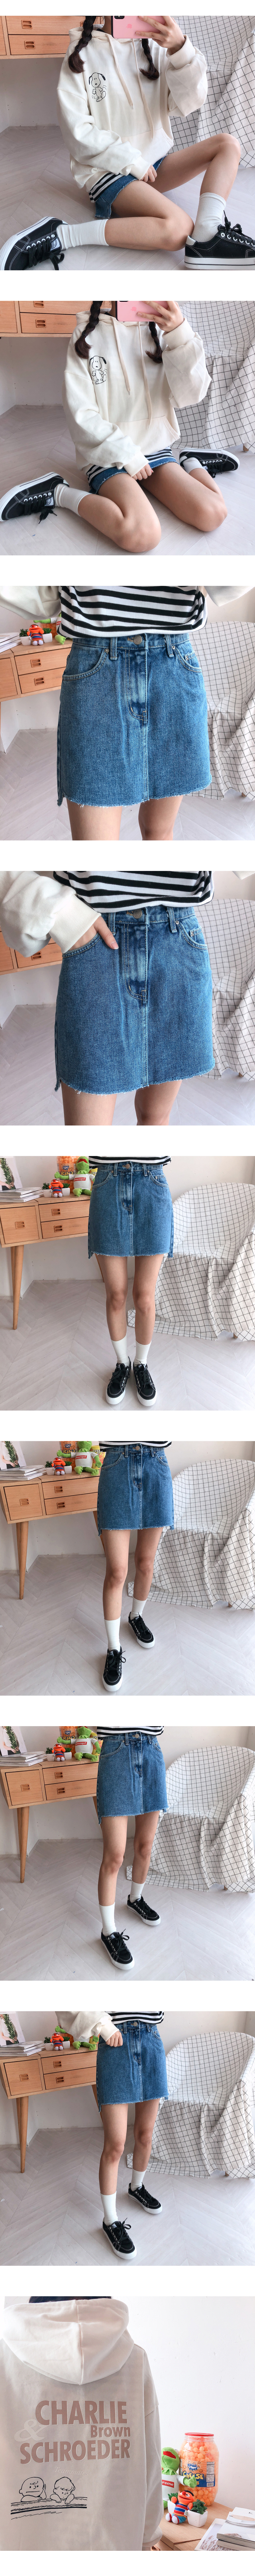 Leeds Square Cut Denim Skirt